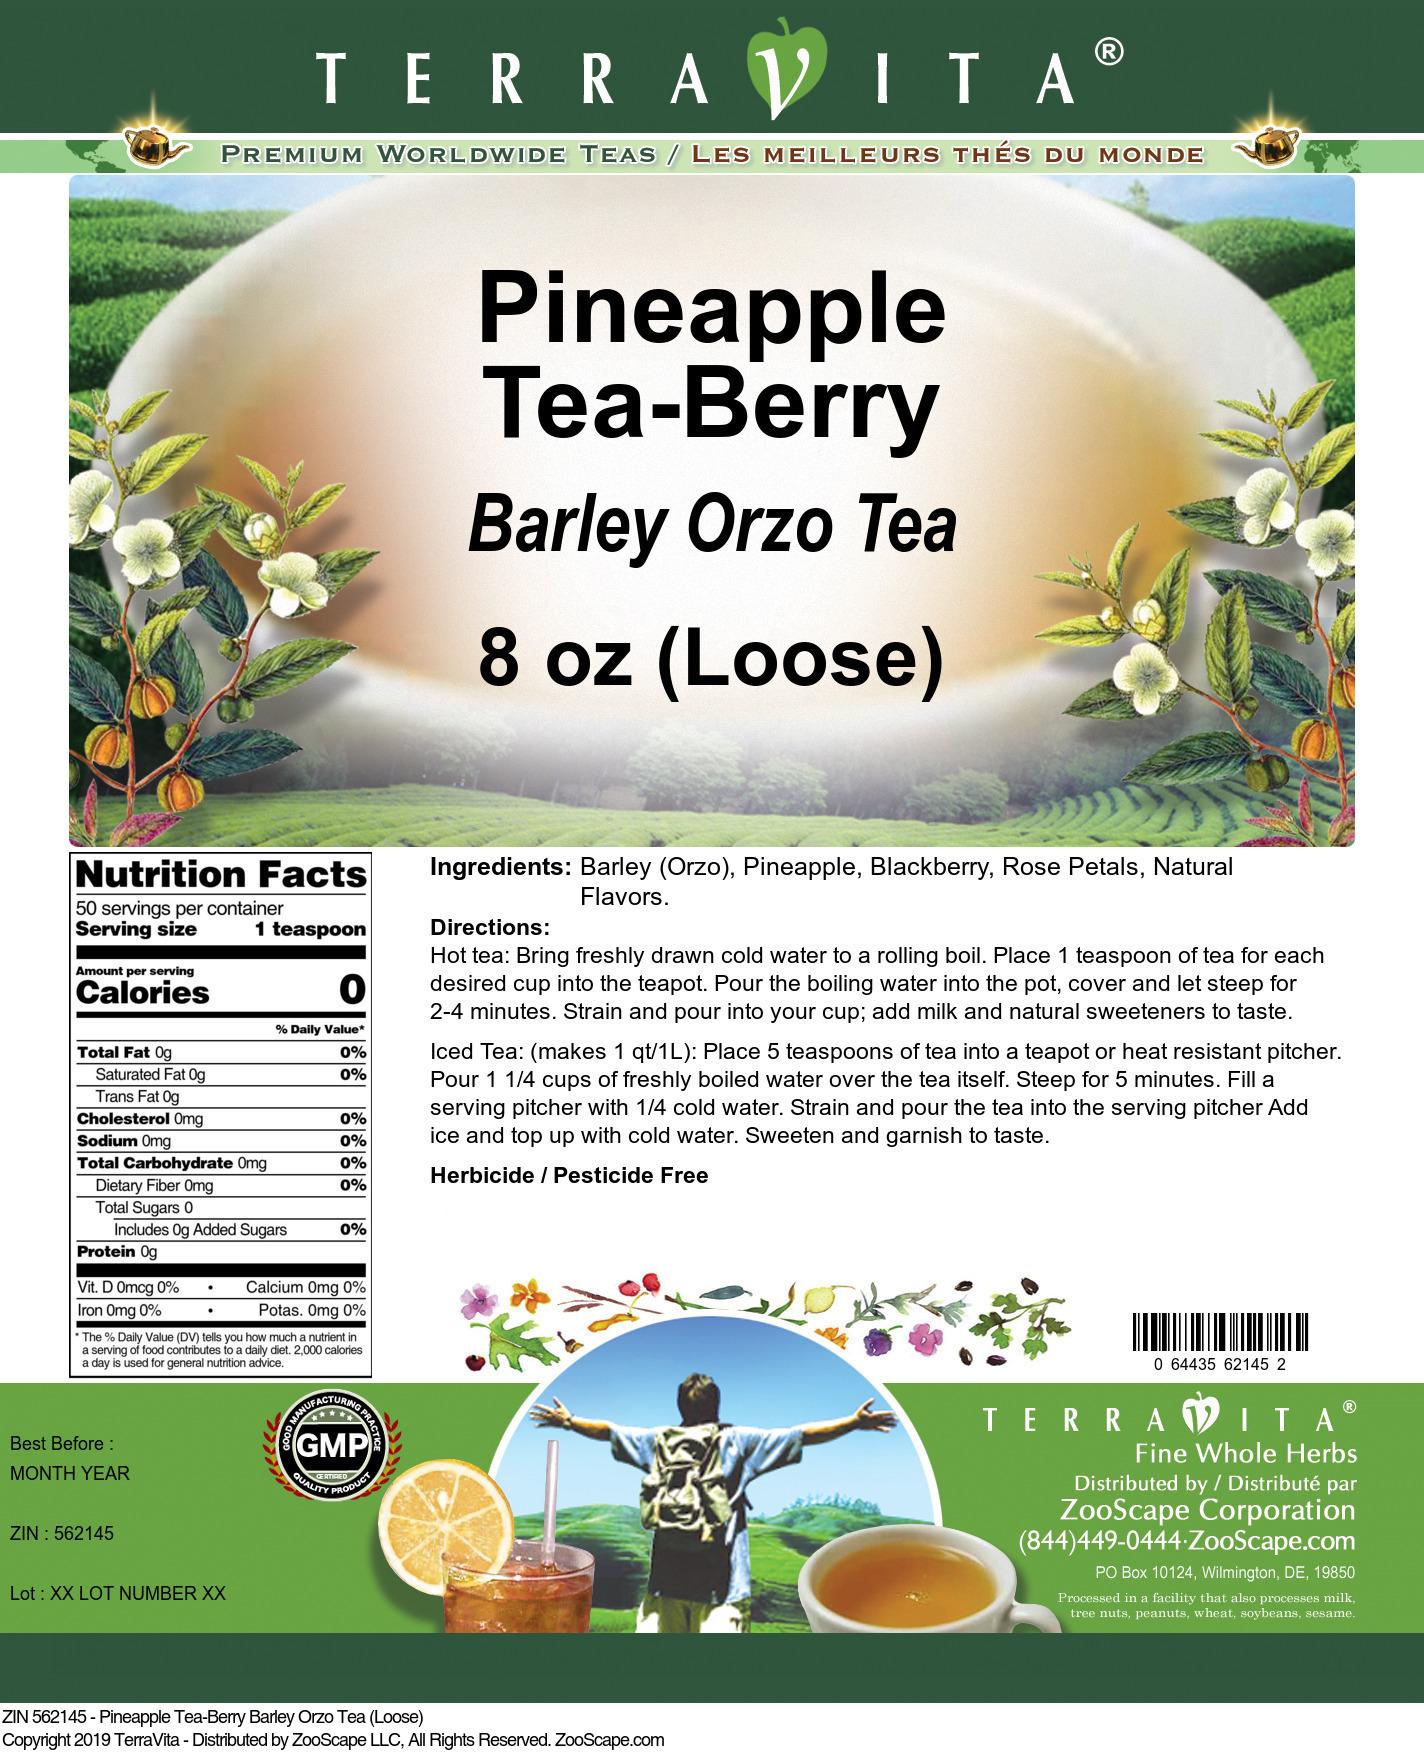 Pineapple Tea-Berry Barley Orzo